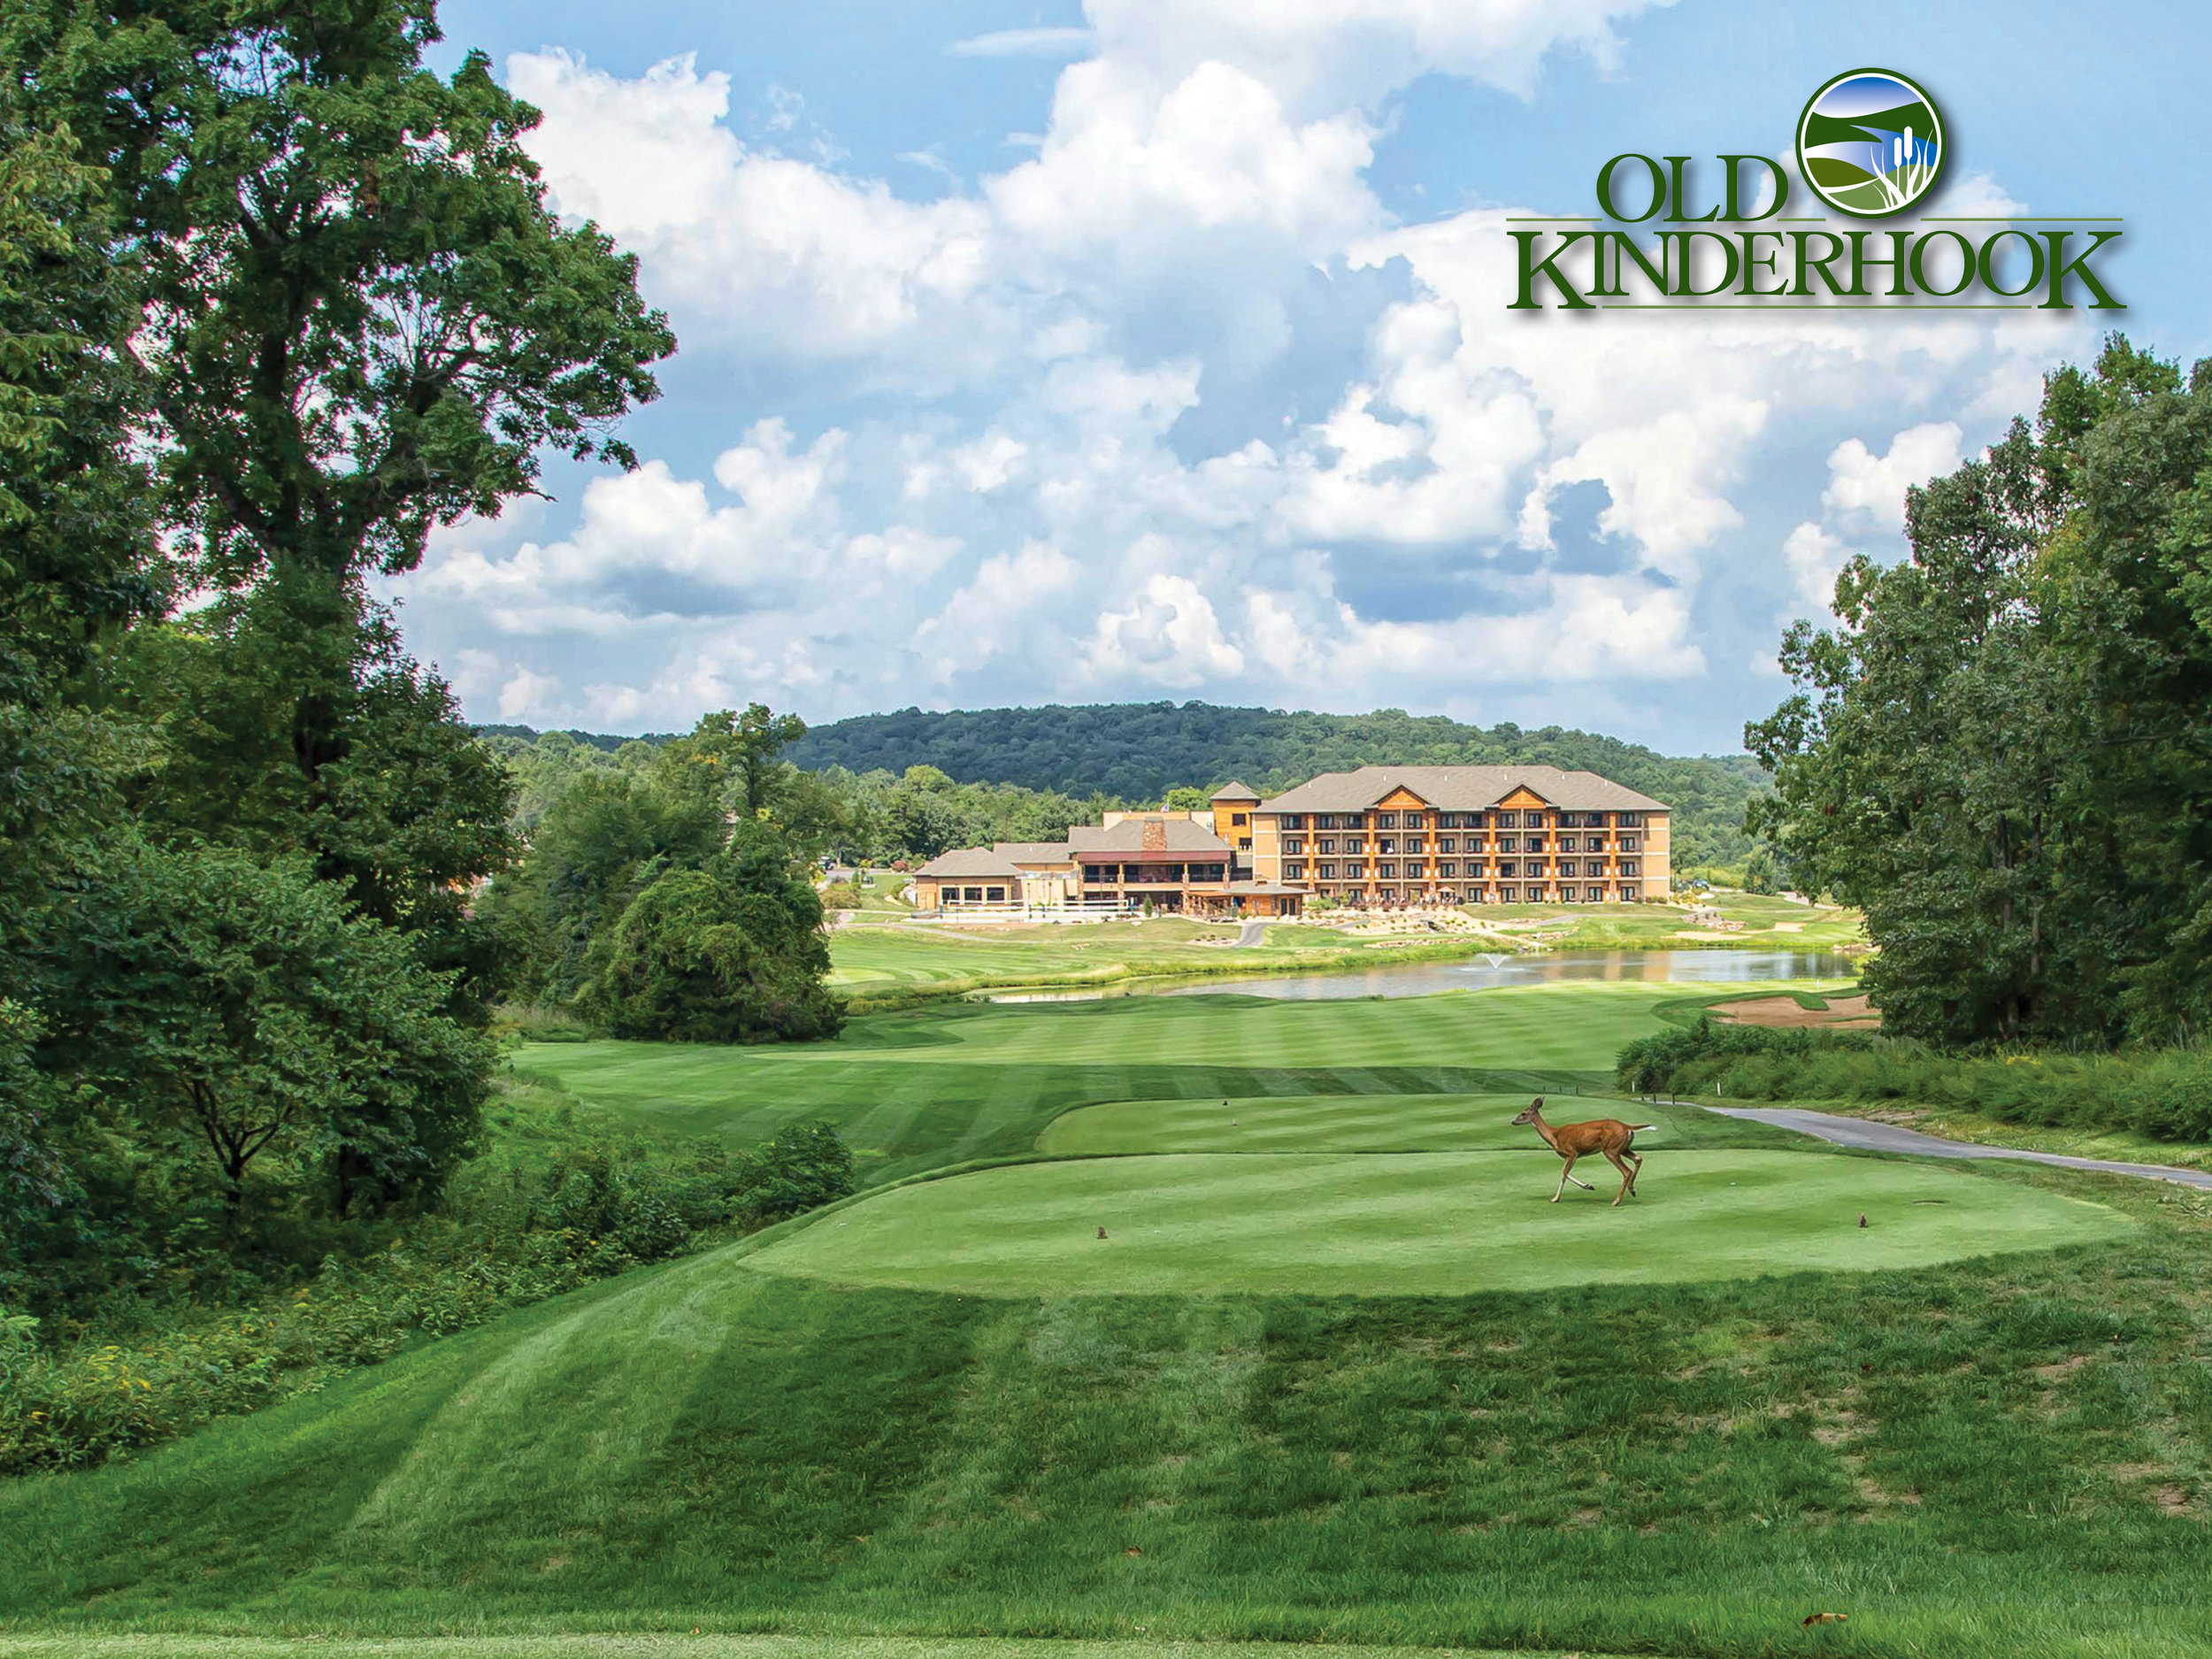 CAmdenton, MO   #2 Ranked course in Missouri - OLD KINDERHOOKSunday, JULY 14th$125